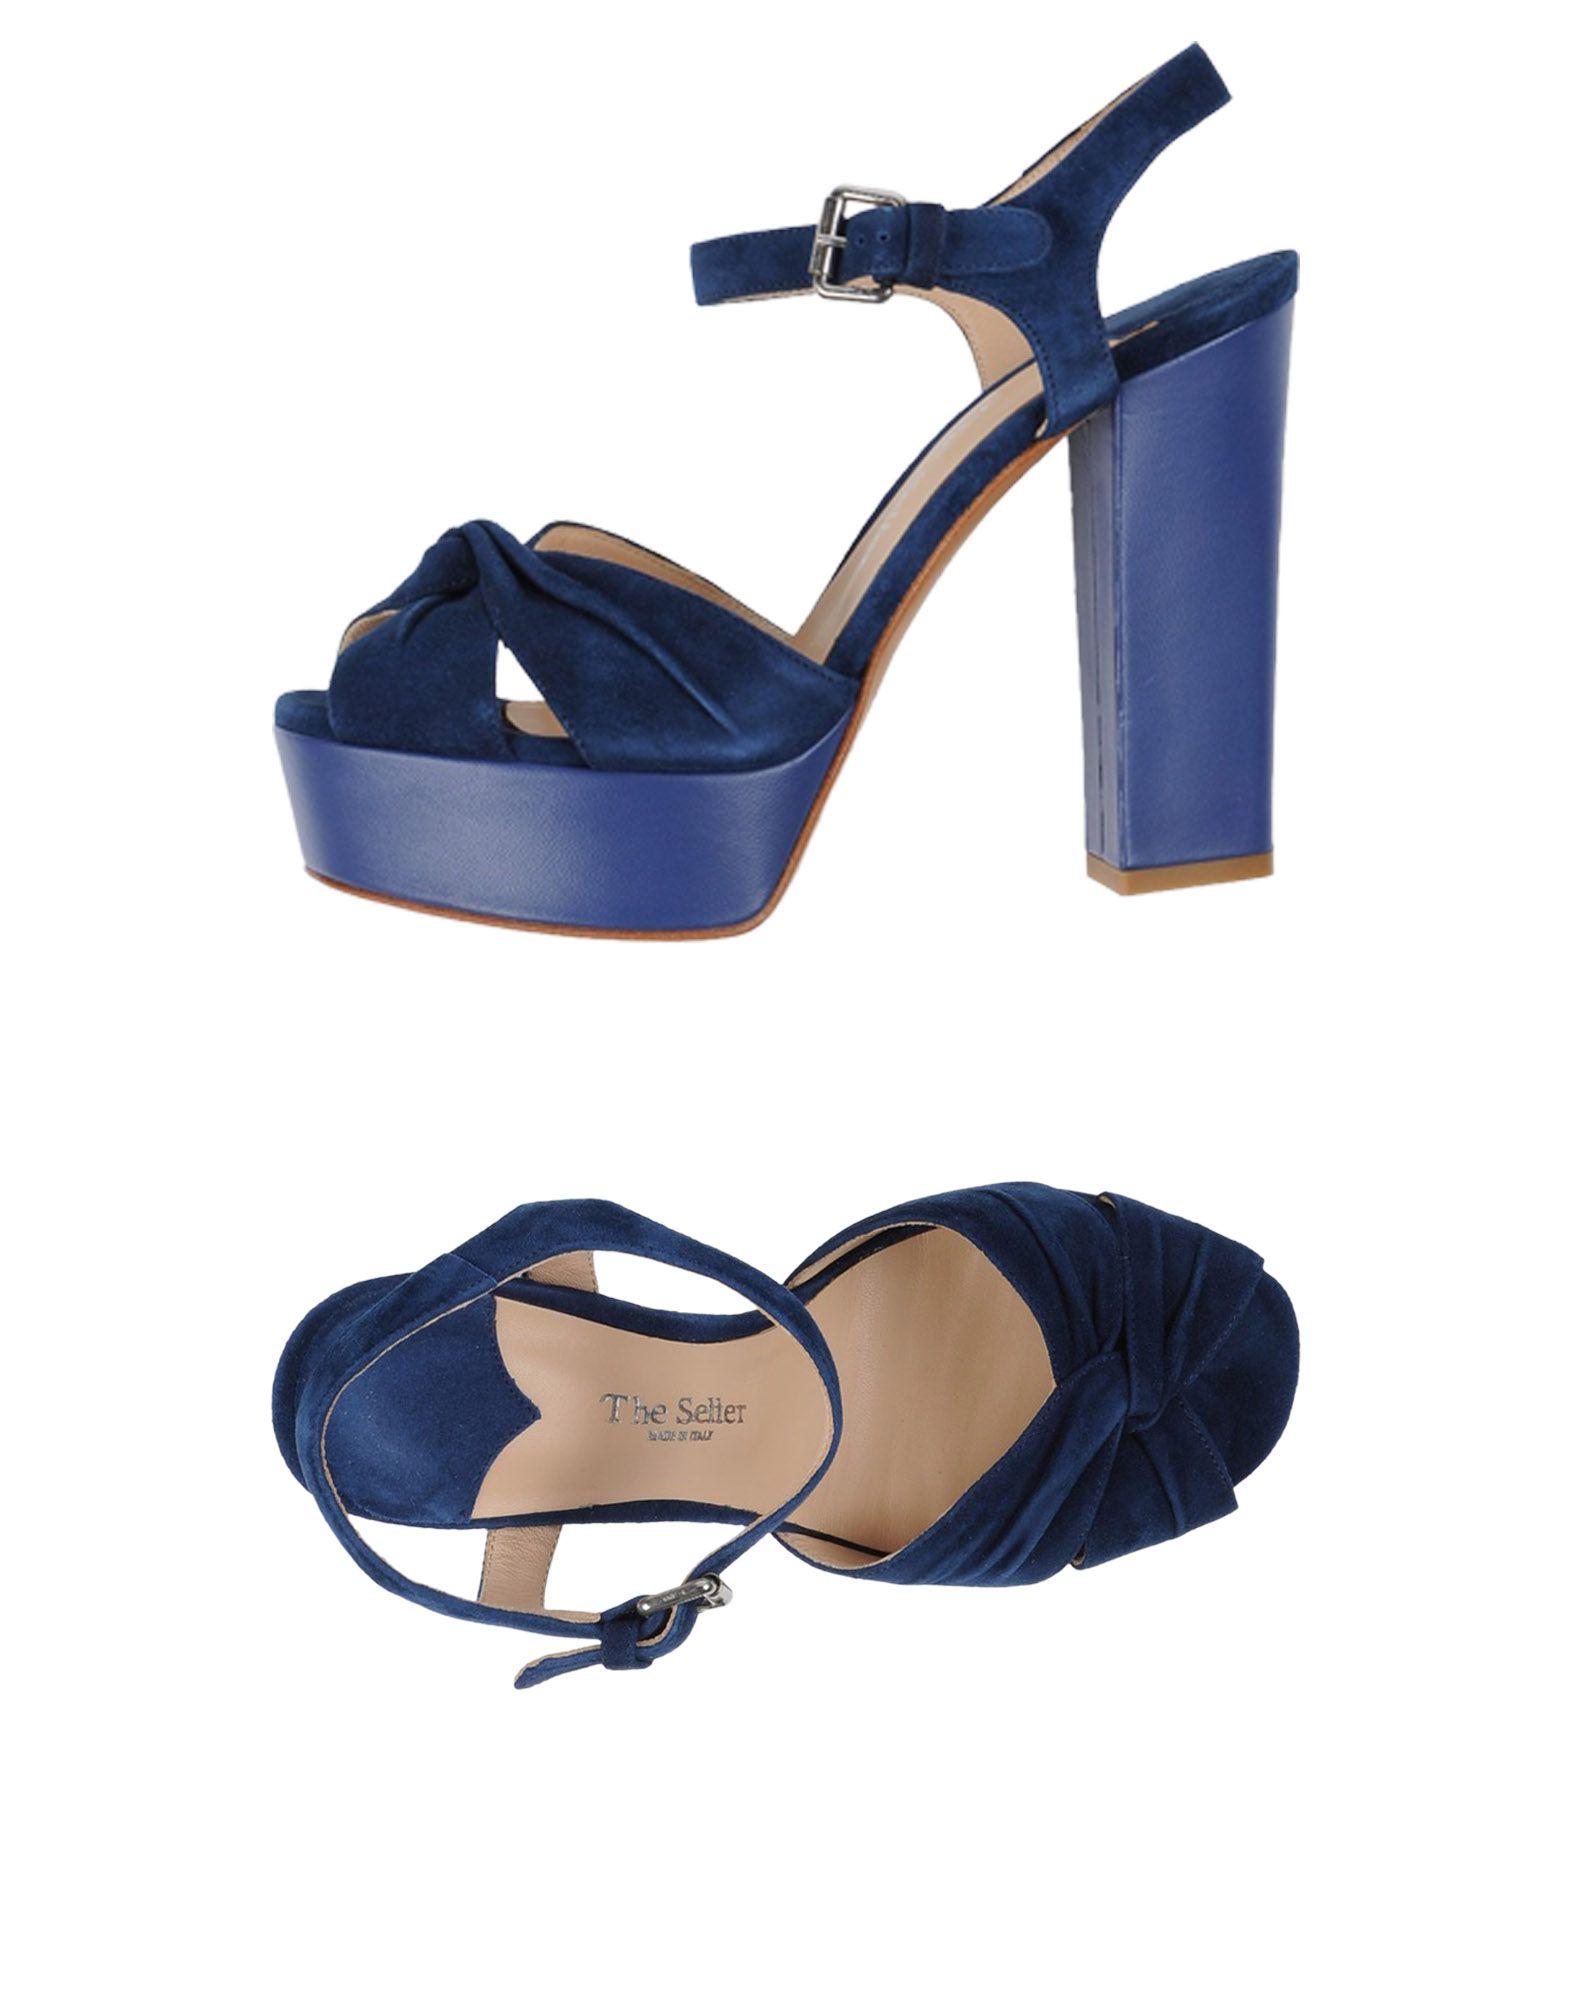 THE SELLER Damen Sandale Farbe Dunkelblau Größe 8 - broschei